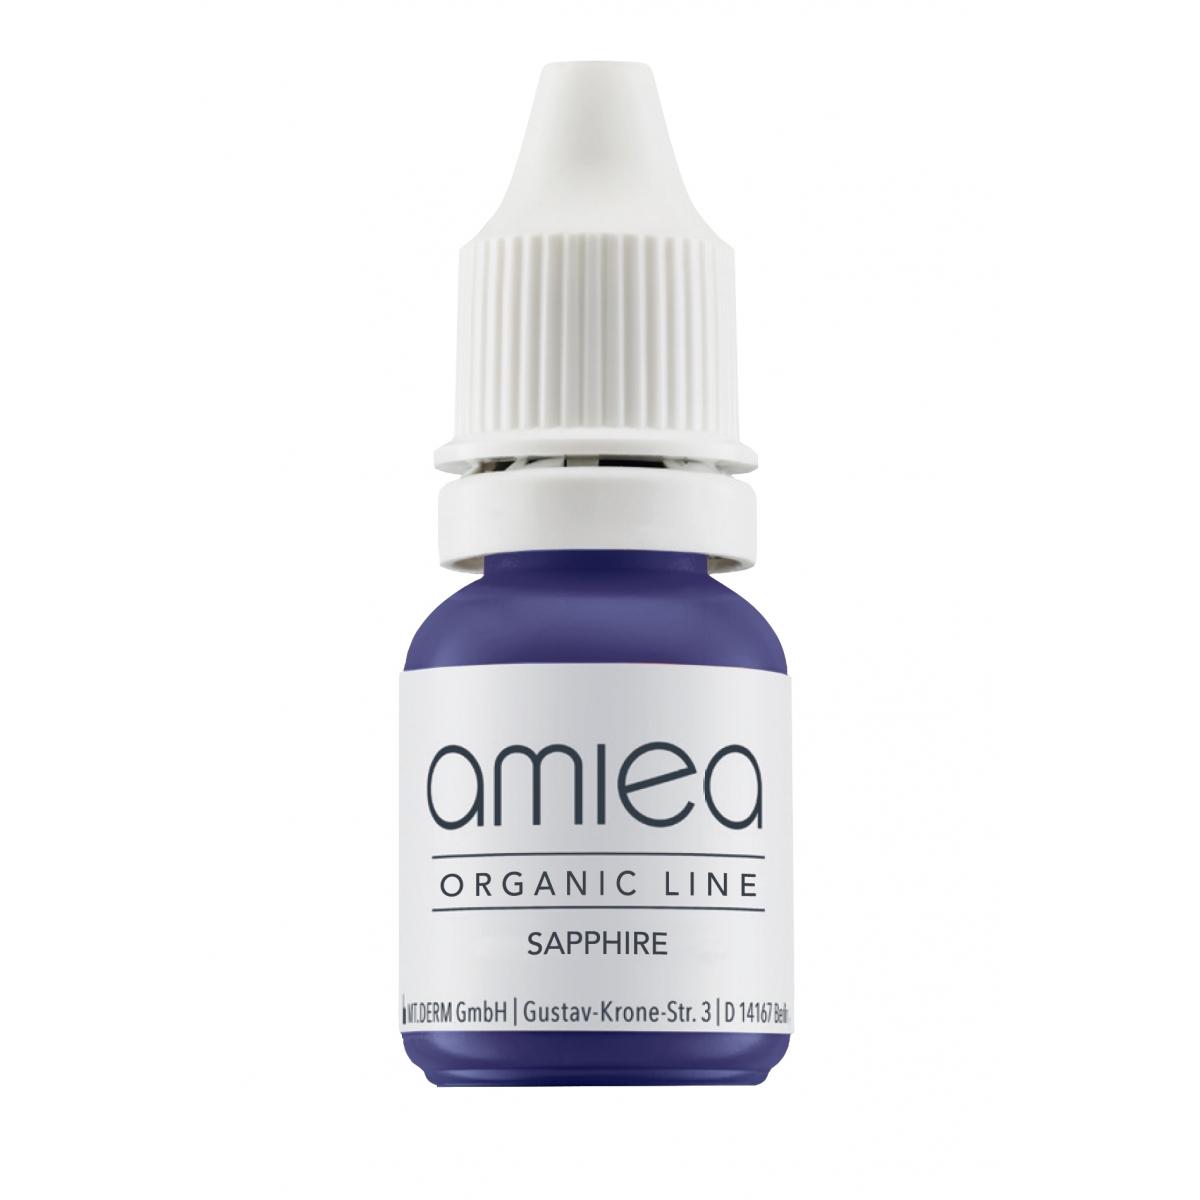 ORGANIC LINE (10ml) - PIGMENT SAPPHIRE ORGANICLINE AMIEA (10 ml)